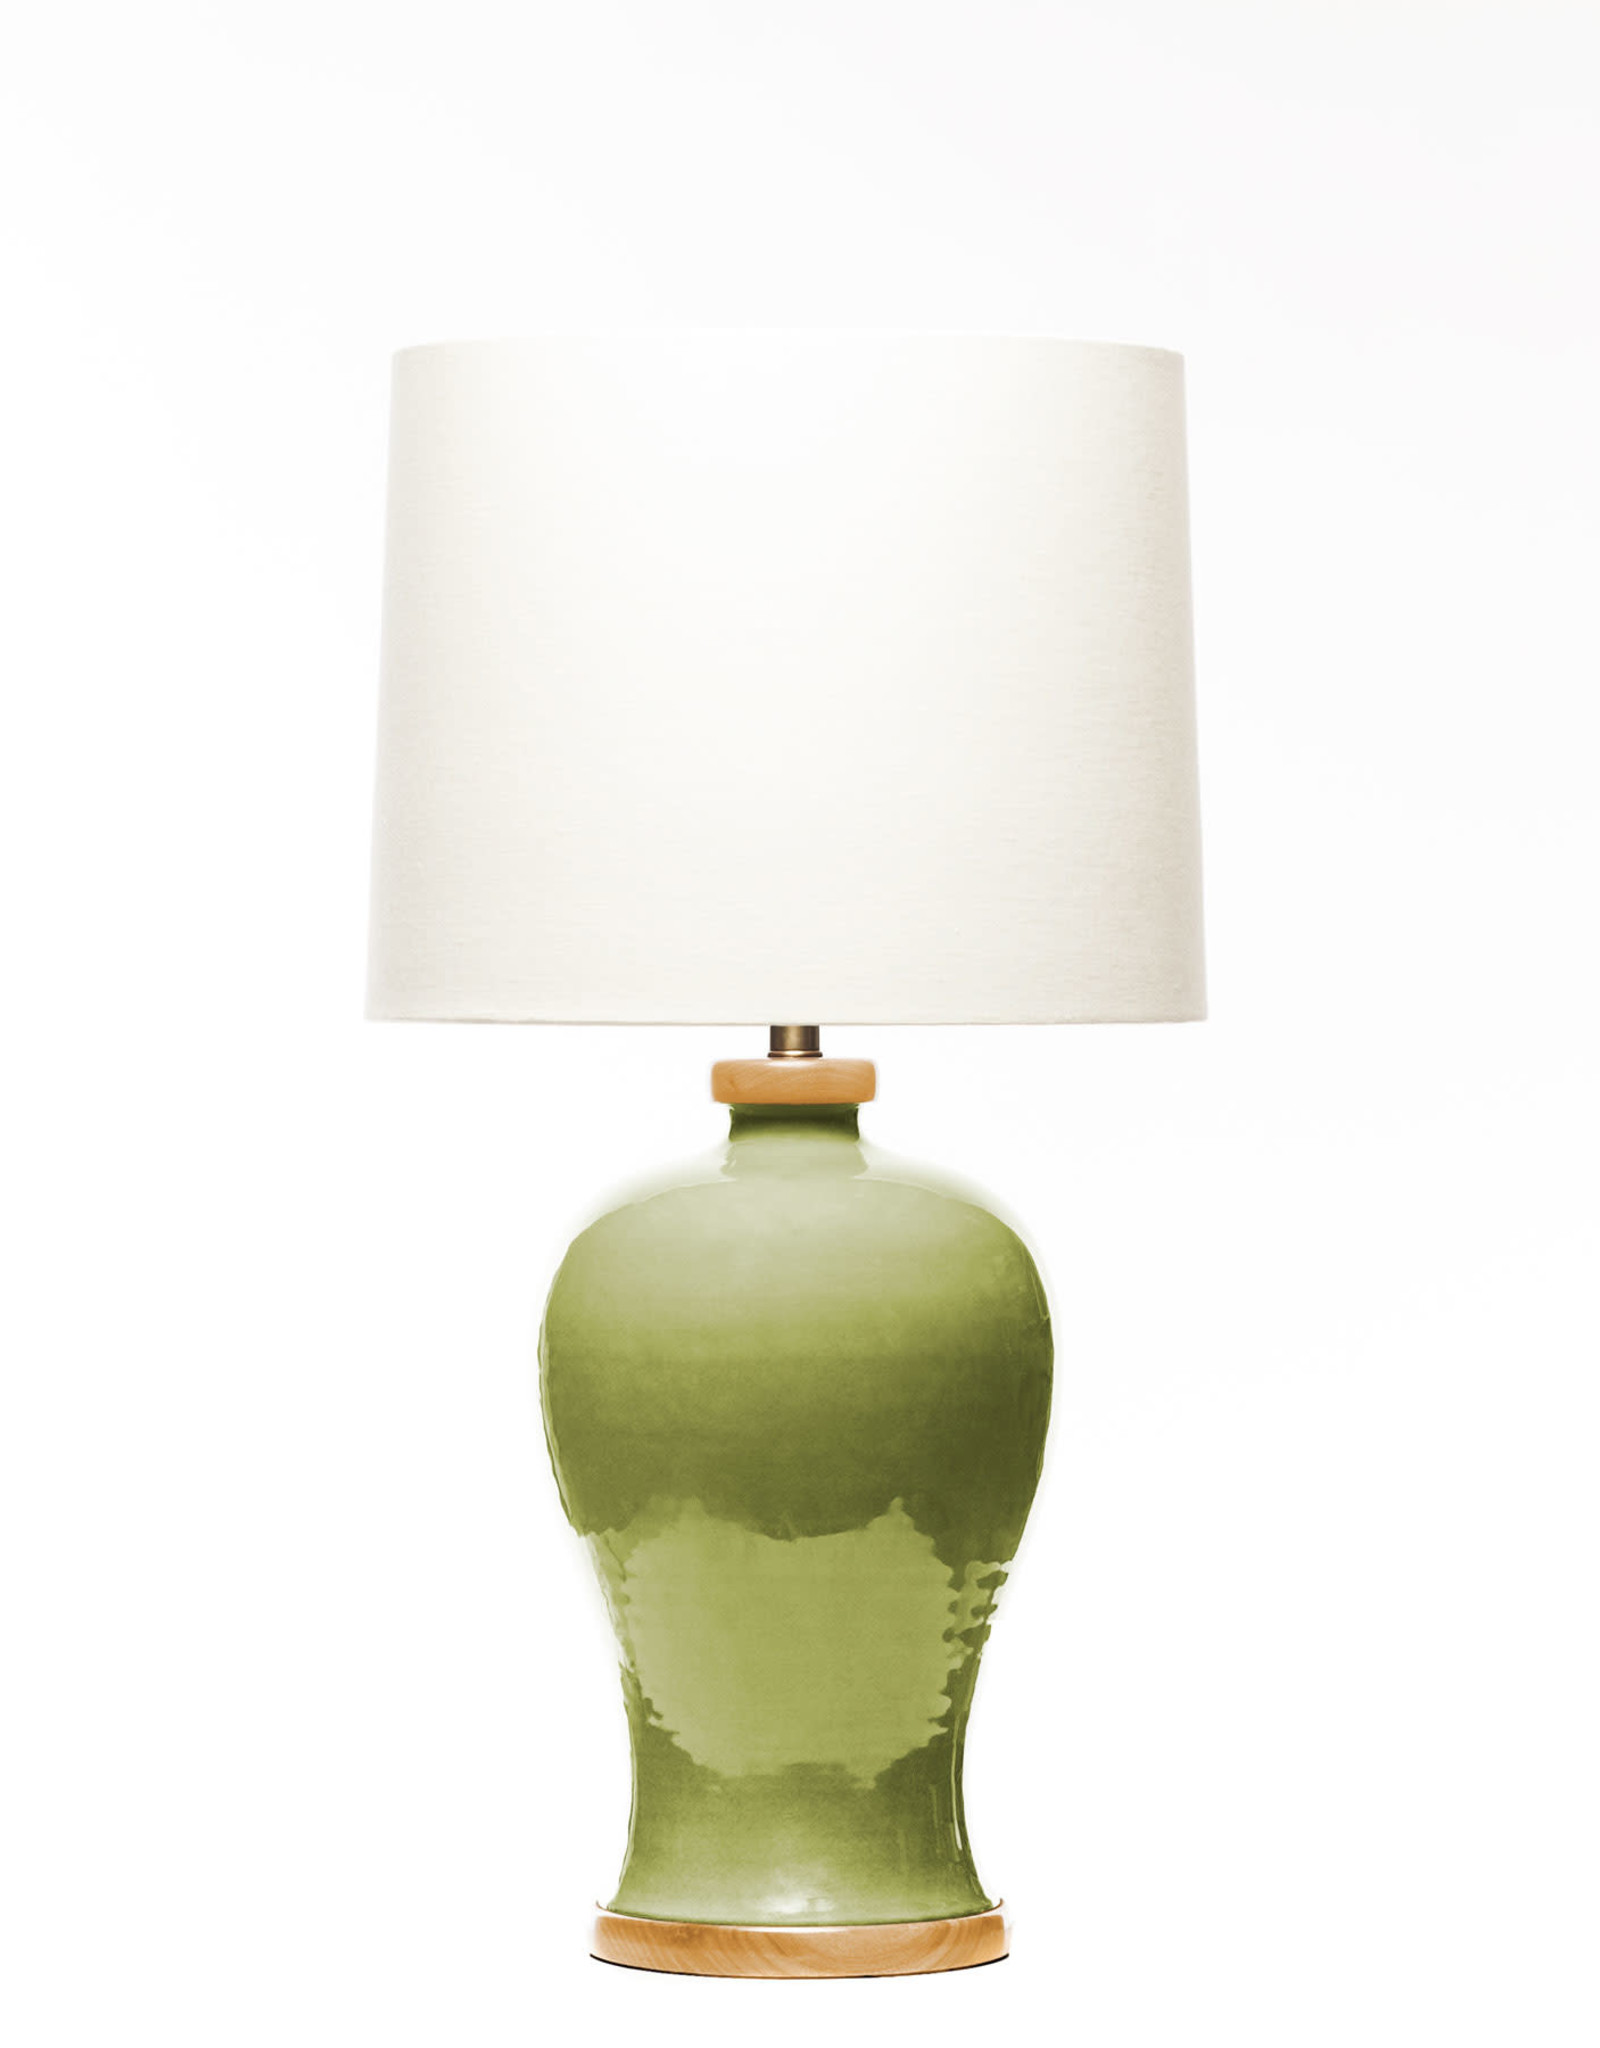 Lawrence & Scott Dashiell Table Lamp in Celadon with Oak Base